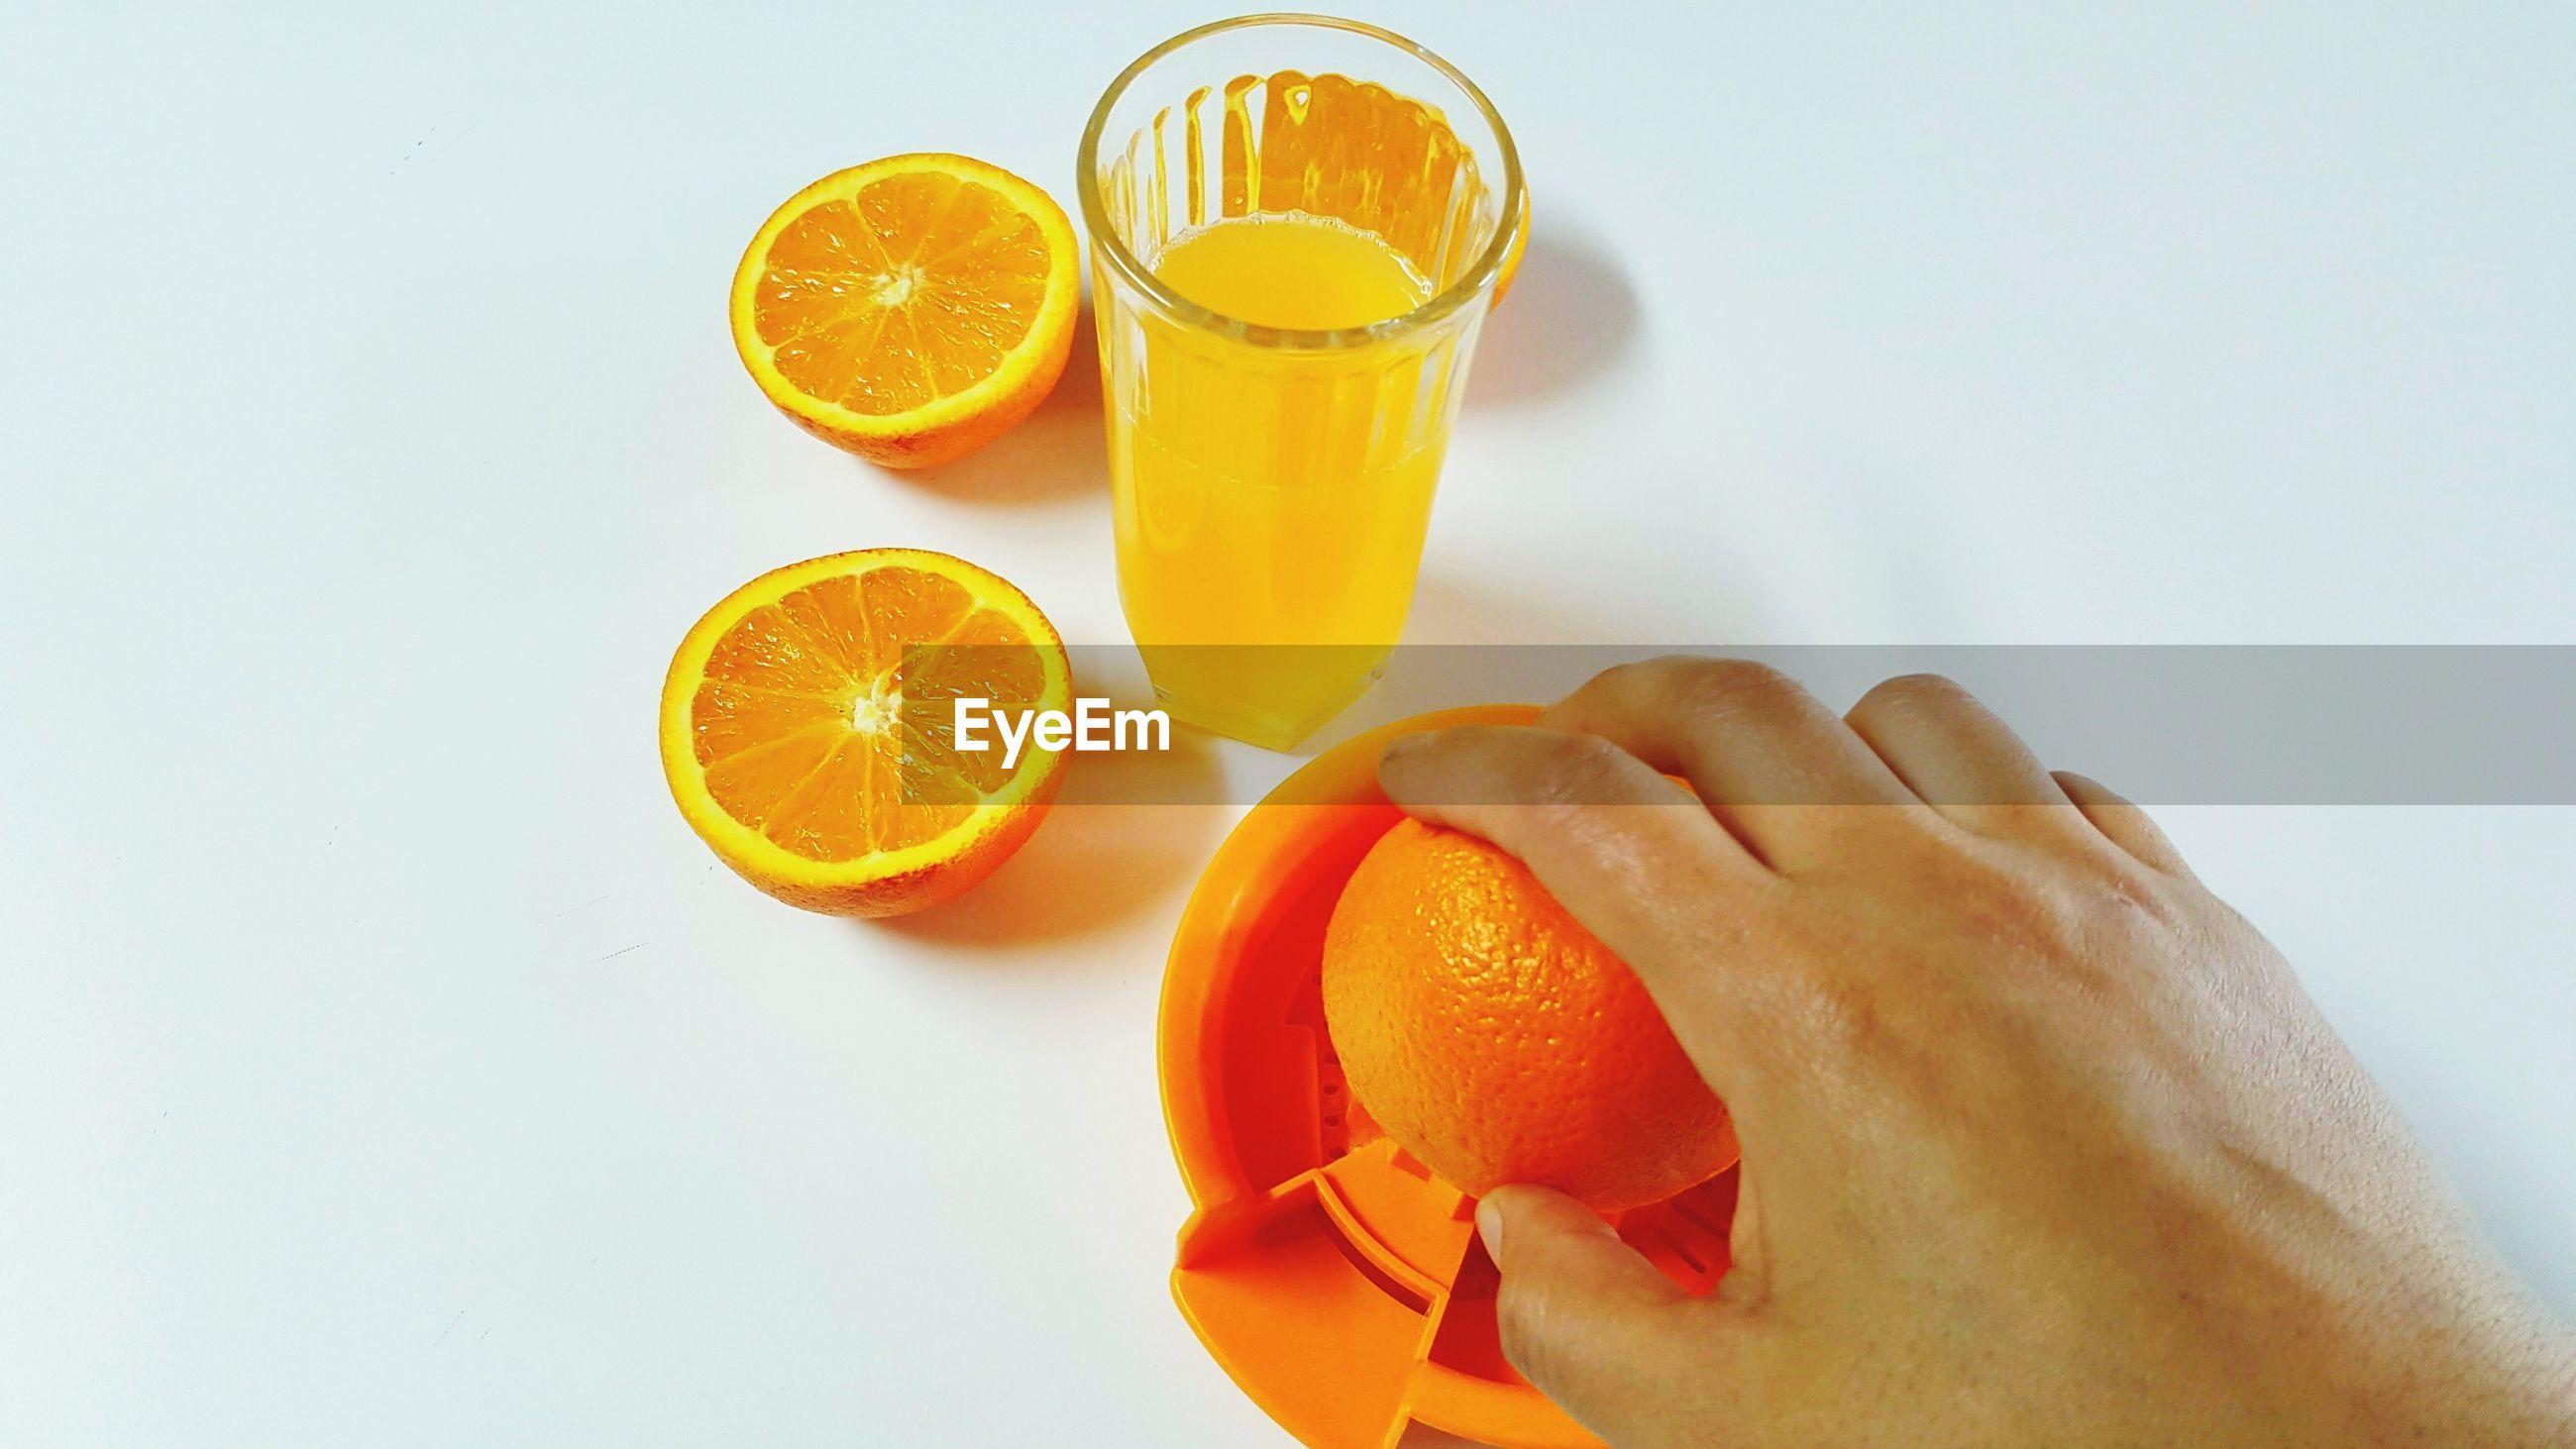 Close-up of cropped hand preparing orange juice against white background